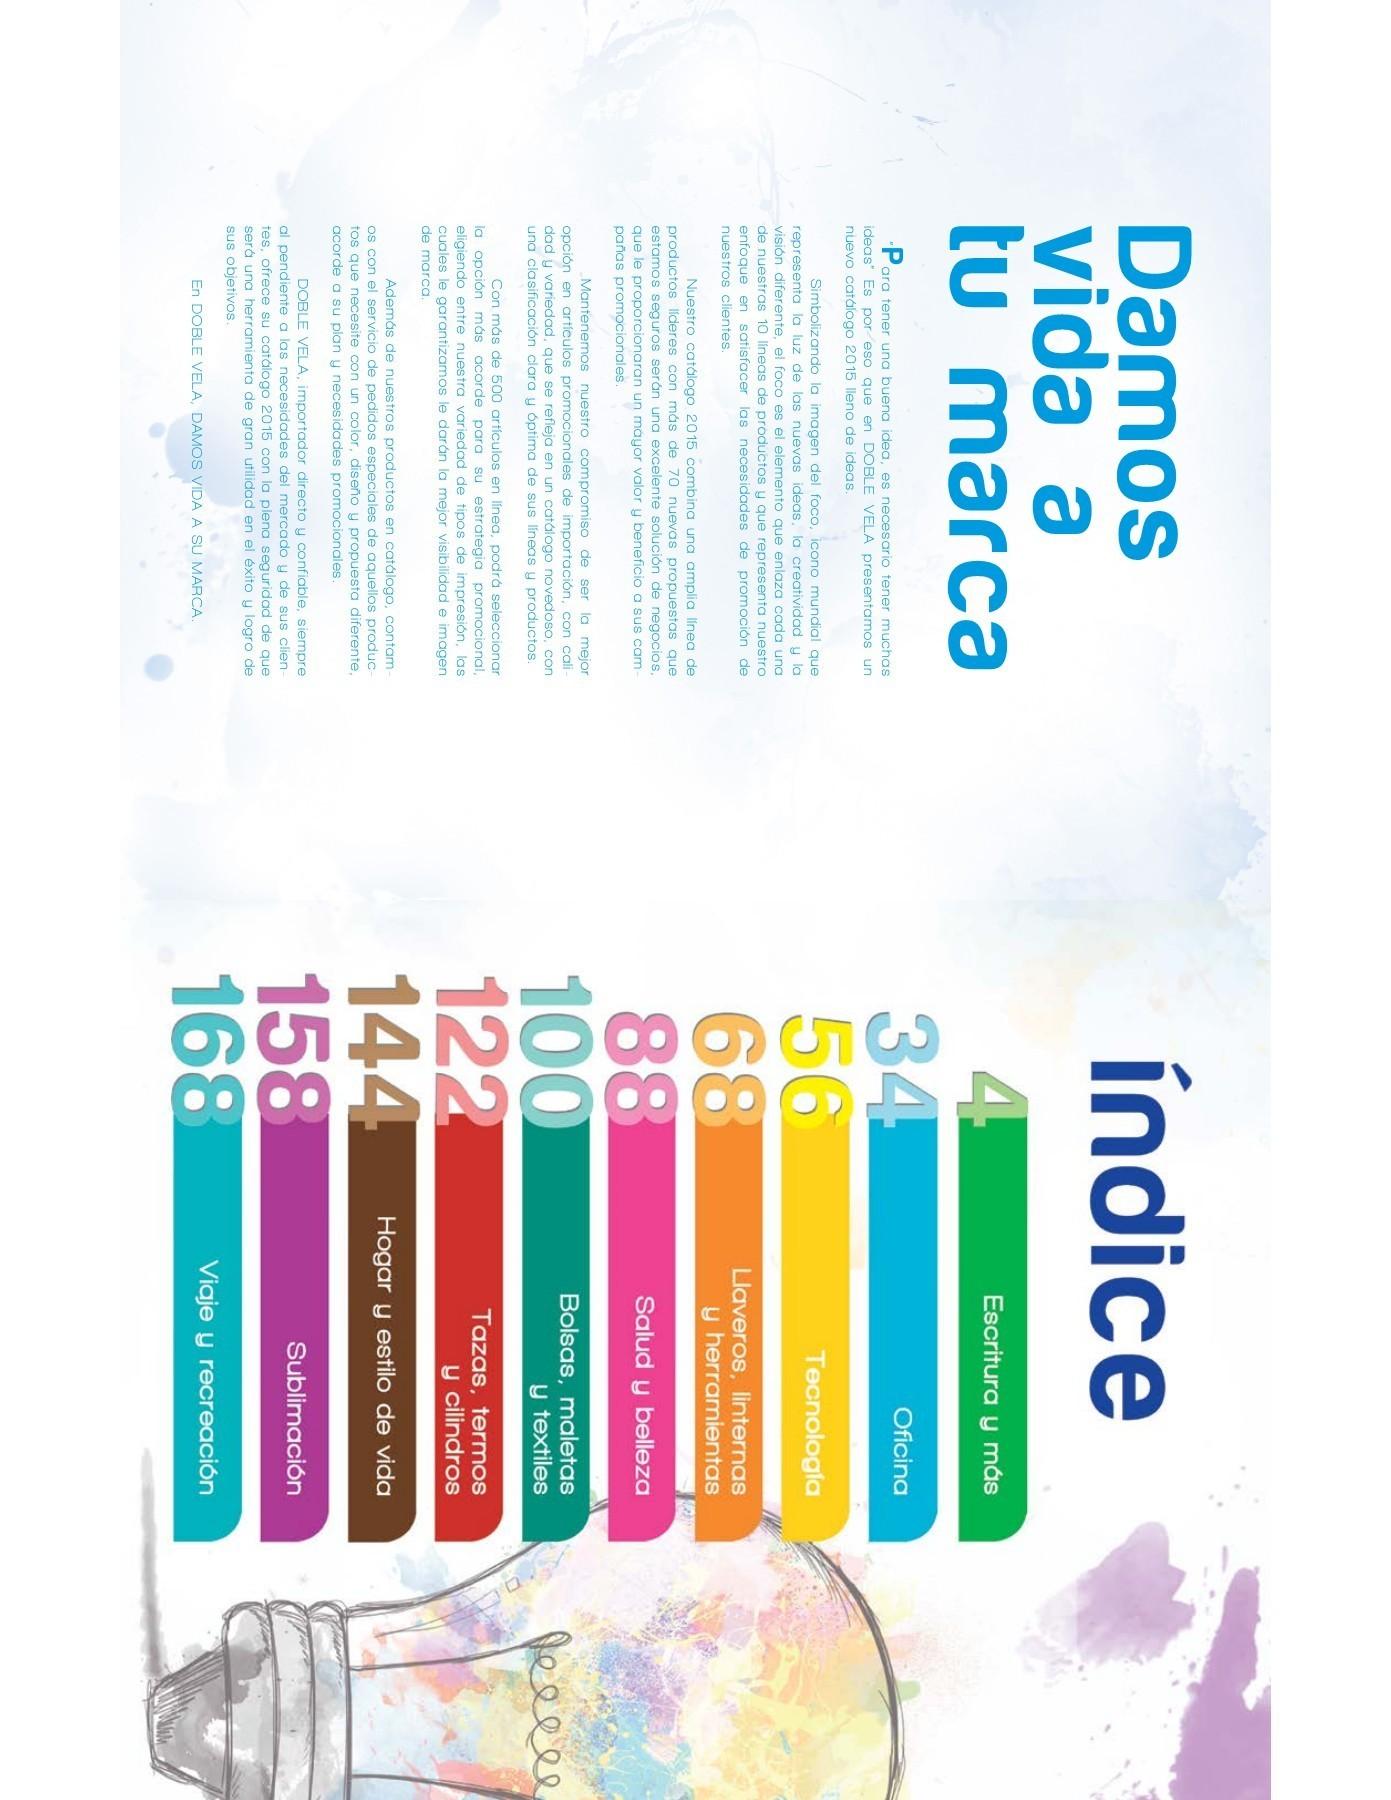 Calendario De 2019 Con Feriados Para Imprimir Más Caliente Catálogo Doblevela Pages 1 50 Text Version Of Calendario De 2019 Con Feriados Para Imprimir Más Caliente 2019 2018 Calendar Printable with Holidays List Kalender Kalendar